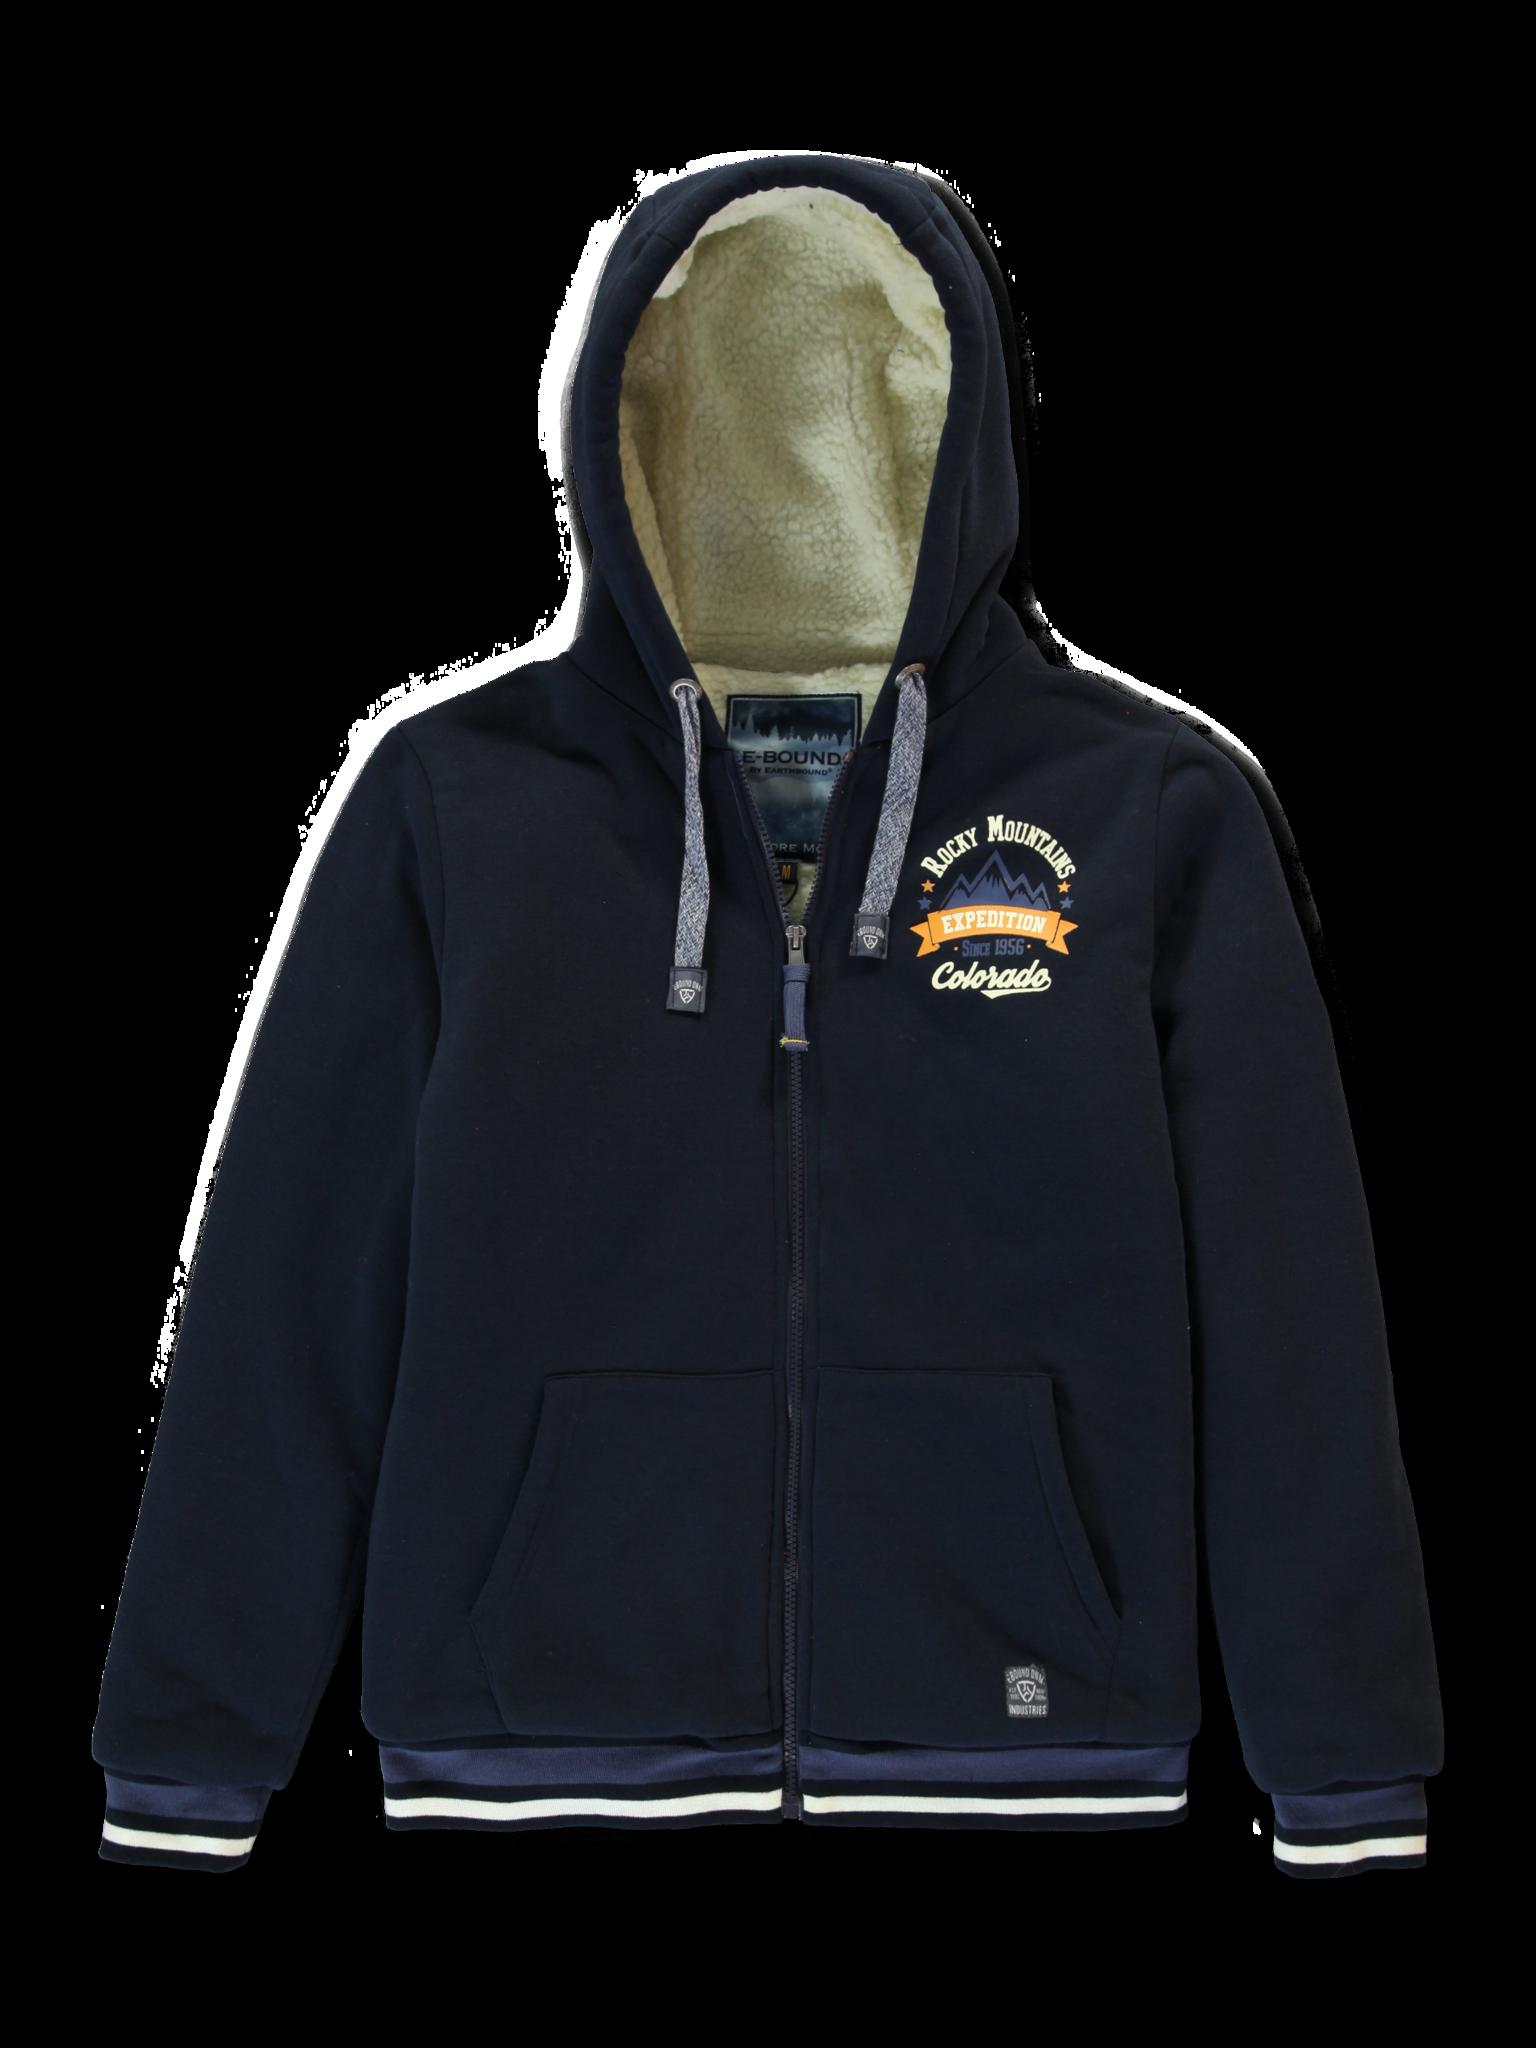 Ebound   Winter 2019 Men   Cardigan Sweater   18 pcs/box